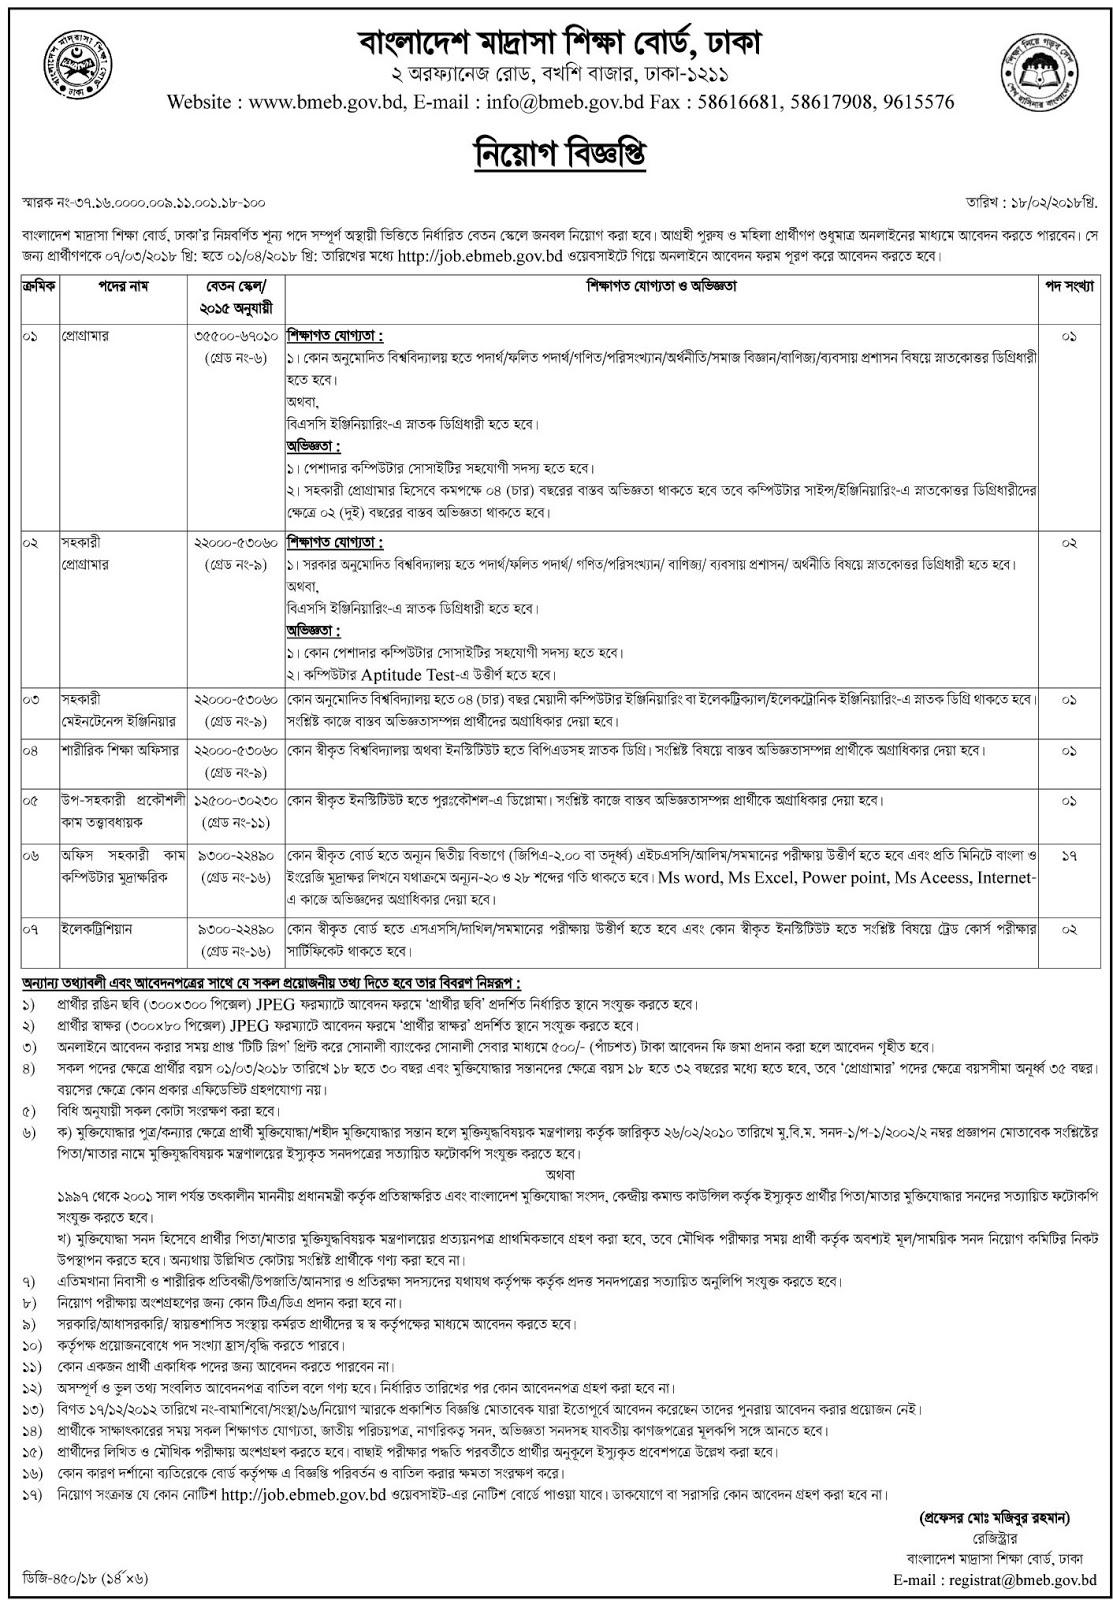 Bangladesh Madrasah Education Board (BMEB) Job Circular 2018